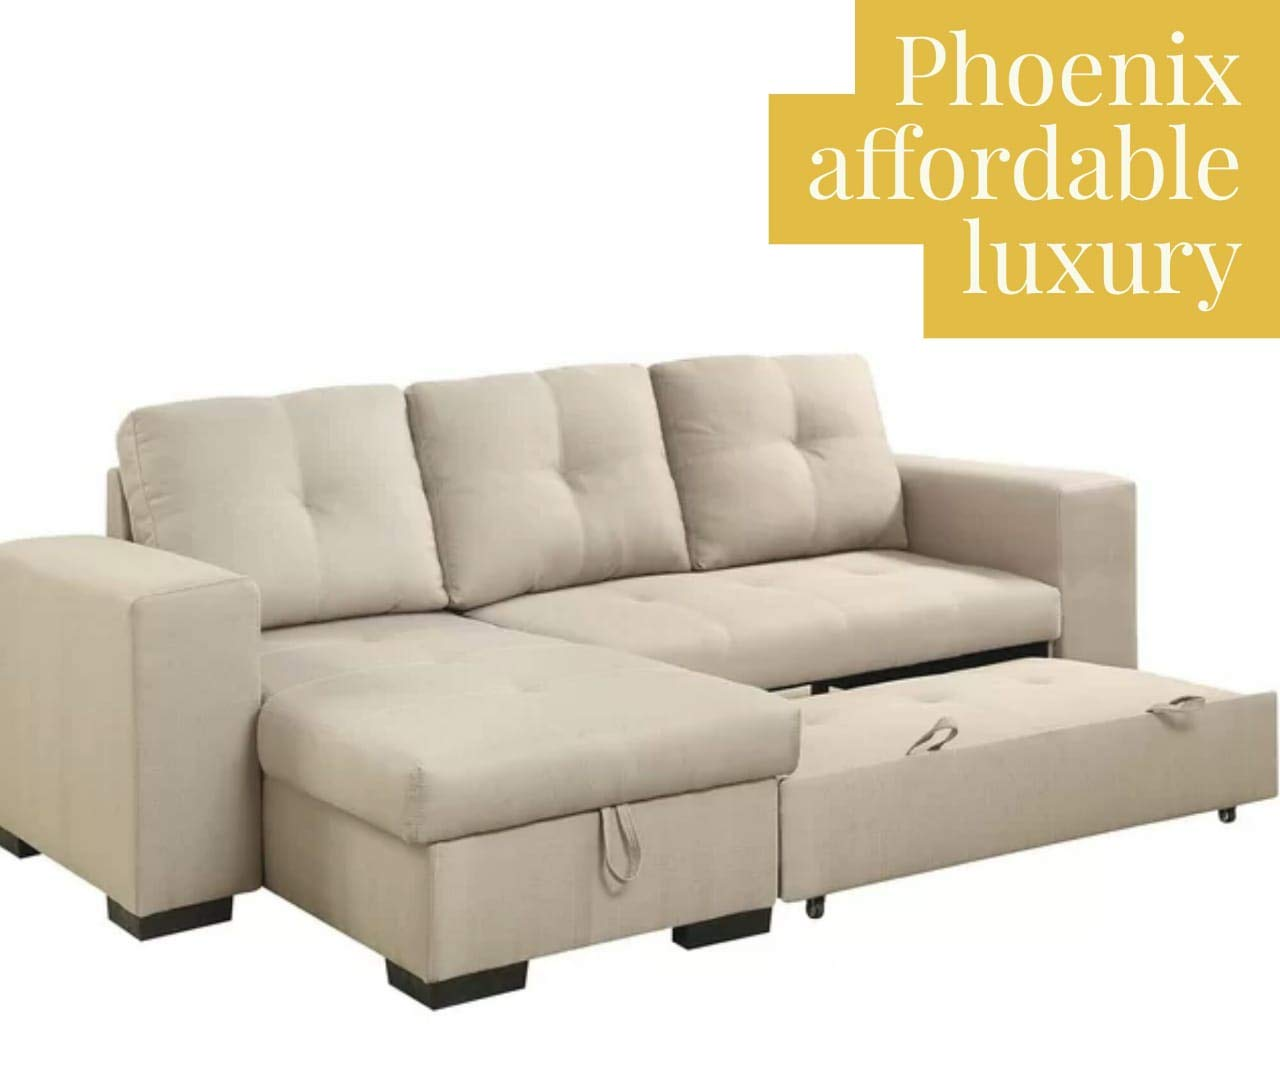 phoenix sofas Scissors Pine Wood Color Sofa Cum Bed with ...